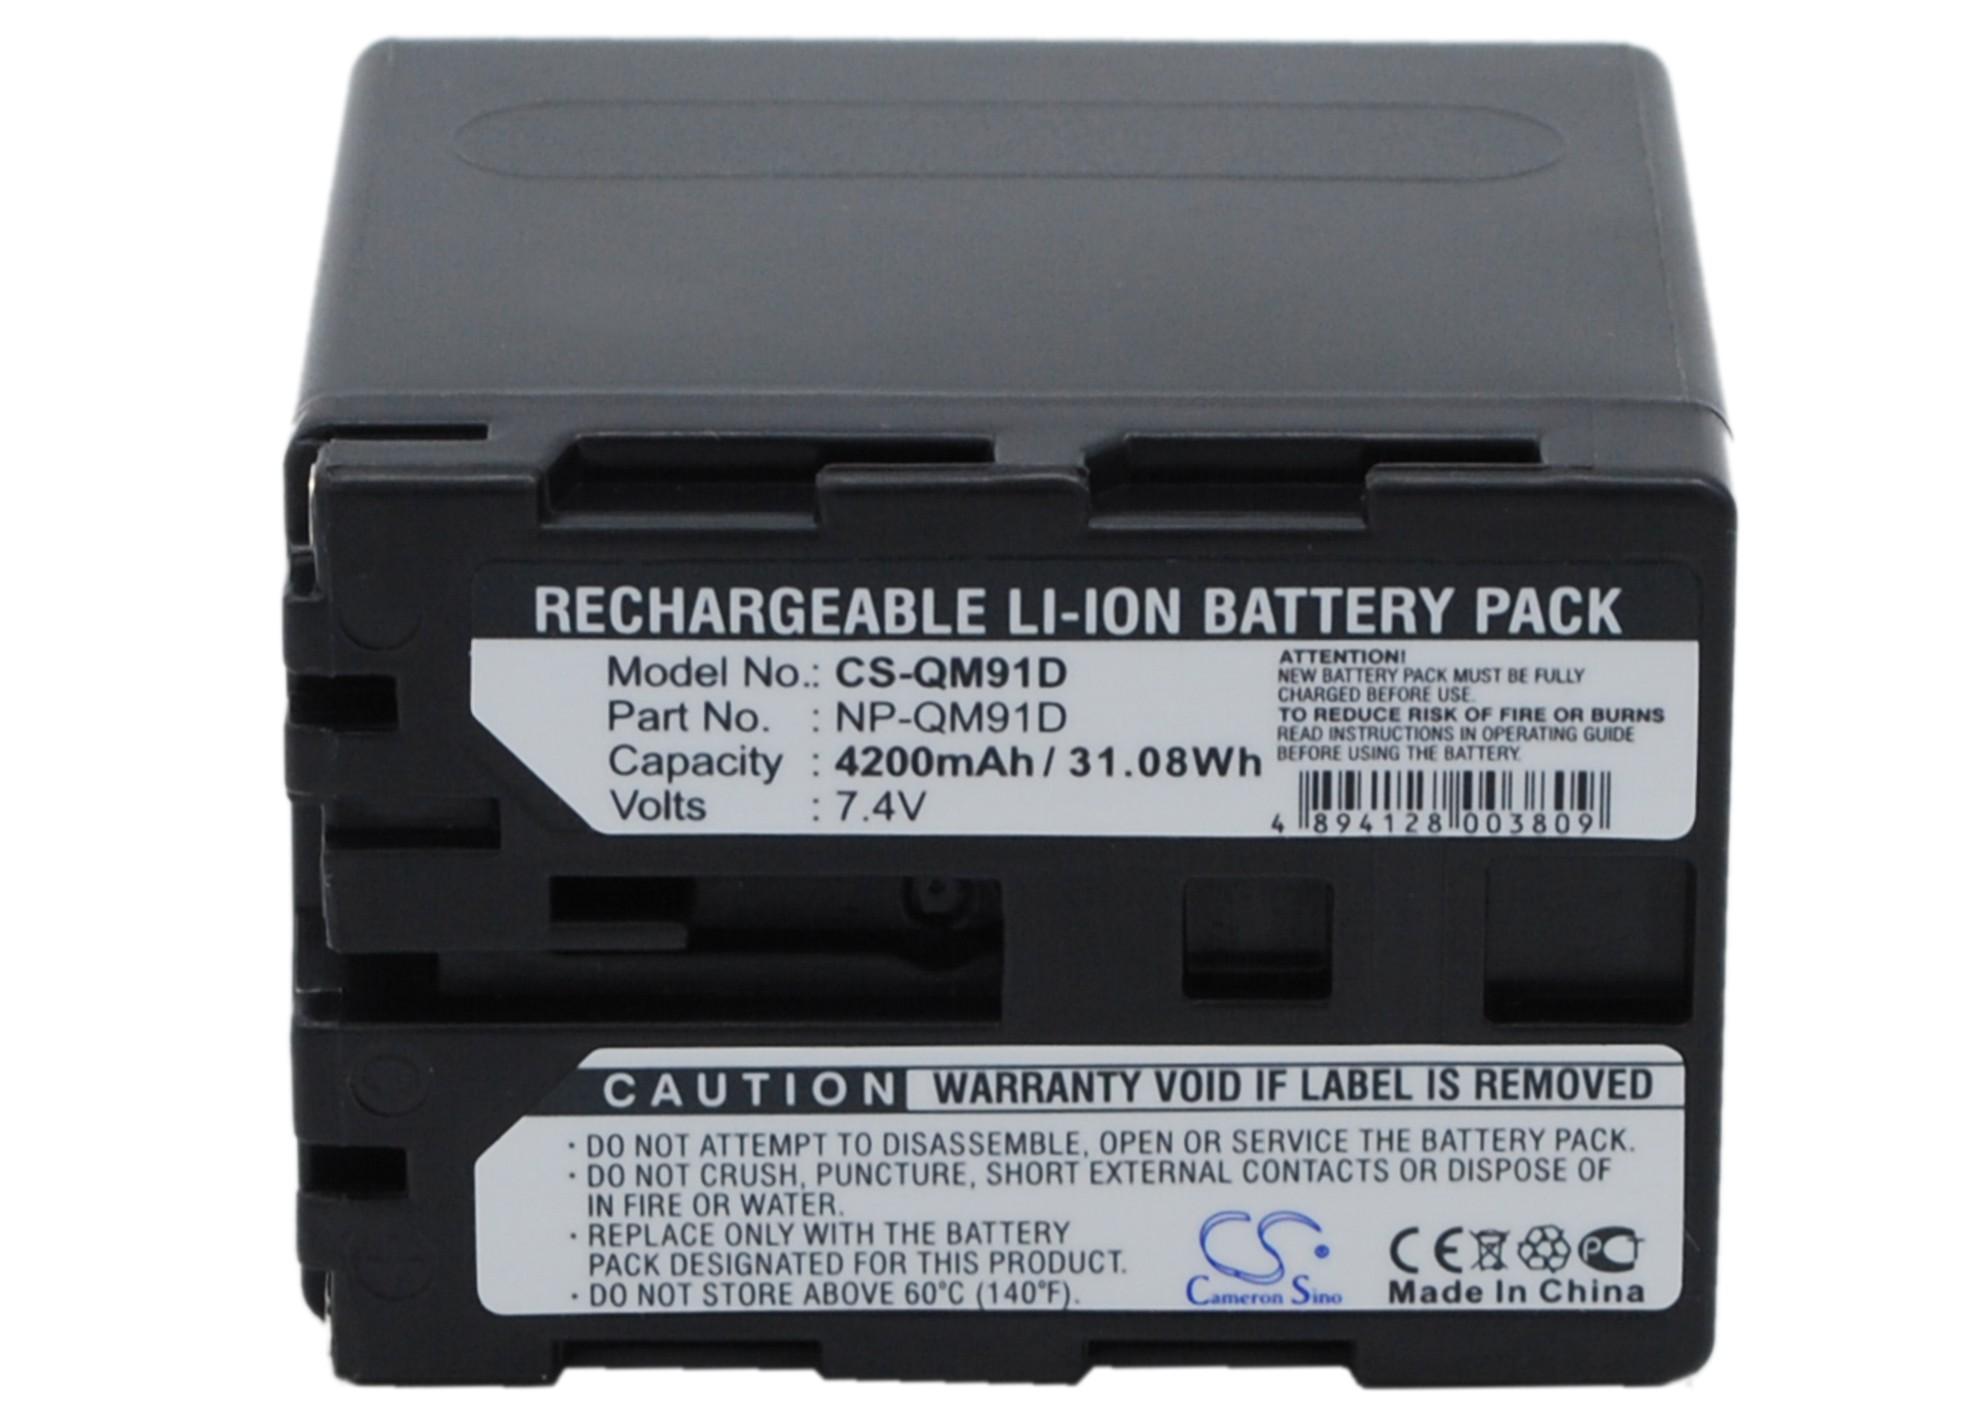 Cameron Sino baterie do kamer a fotoaparátů pro SONY DCR-DVD201 7.4V Li-ion 4200mAh tmavě šedá - neoriginální